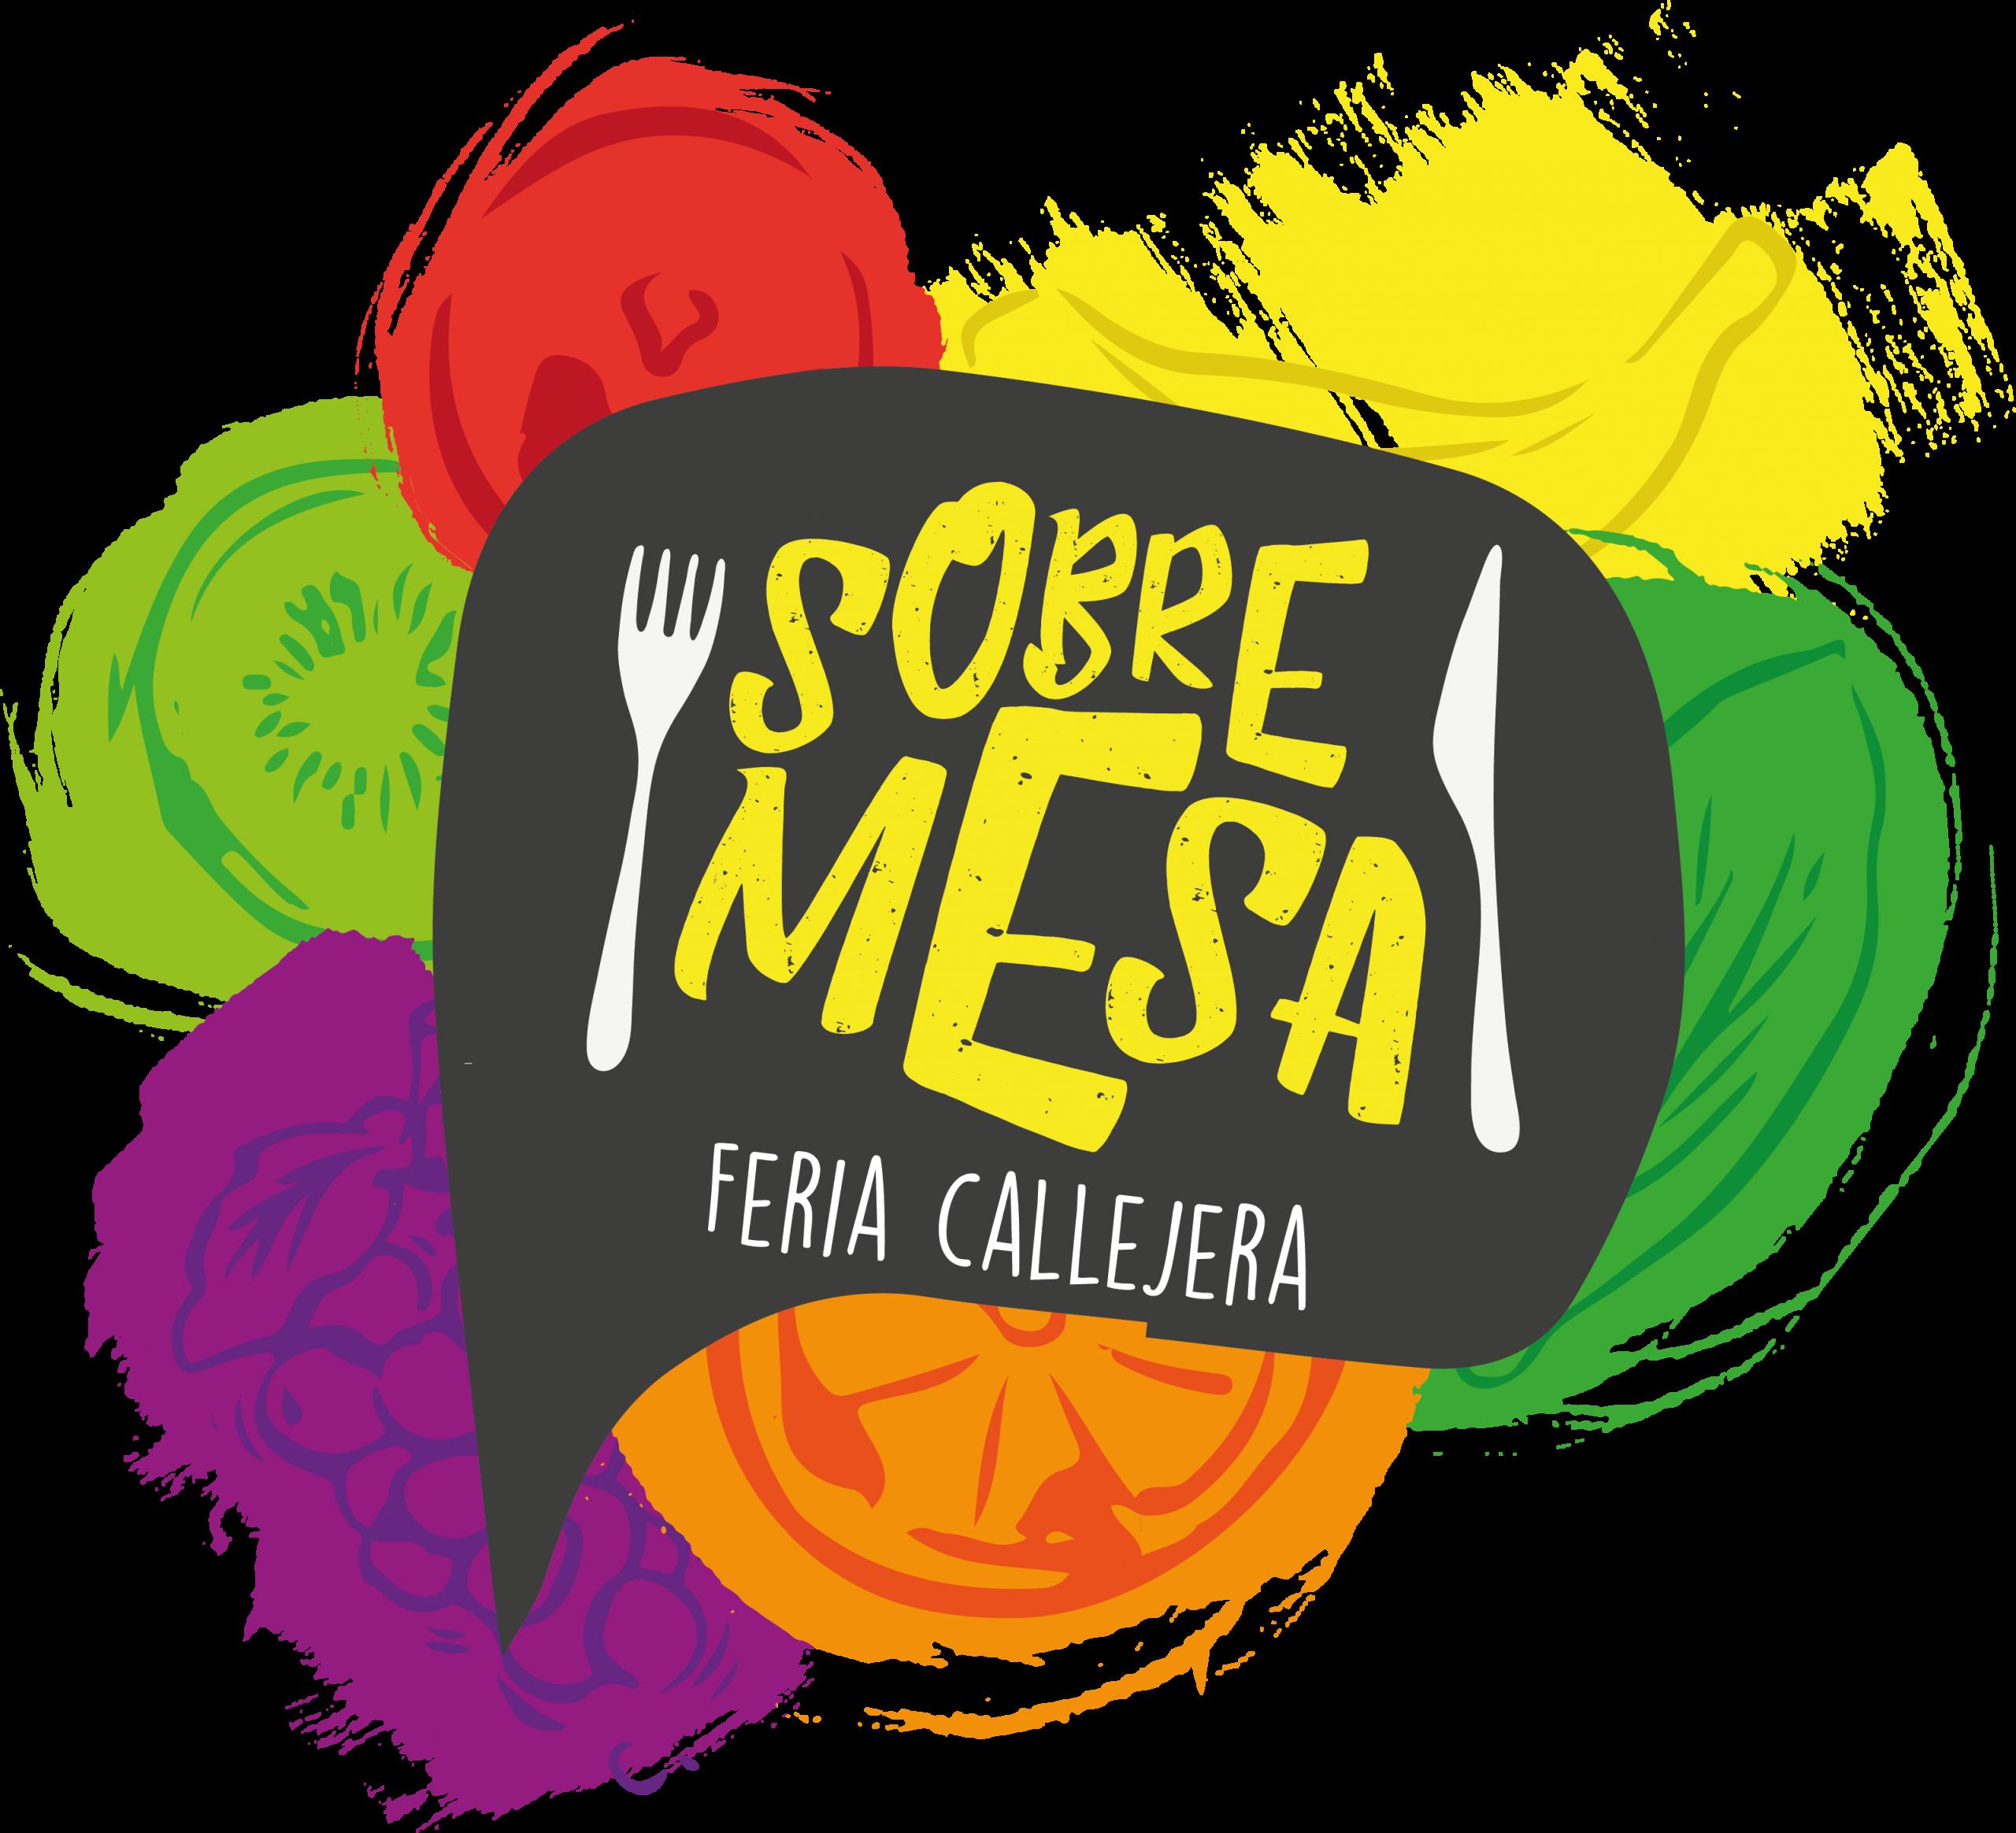 Sobremesa, la feria gastronómica de Valparaíso se realizará este fin de semana.